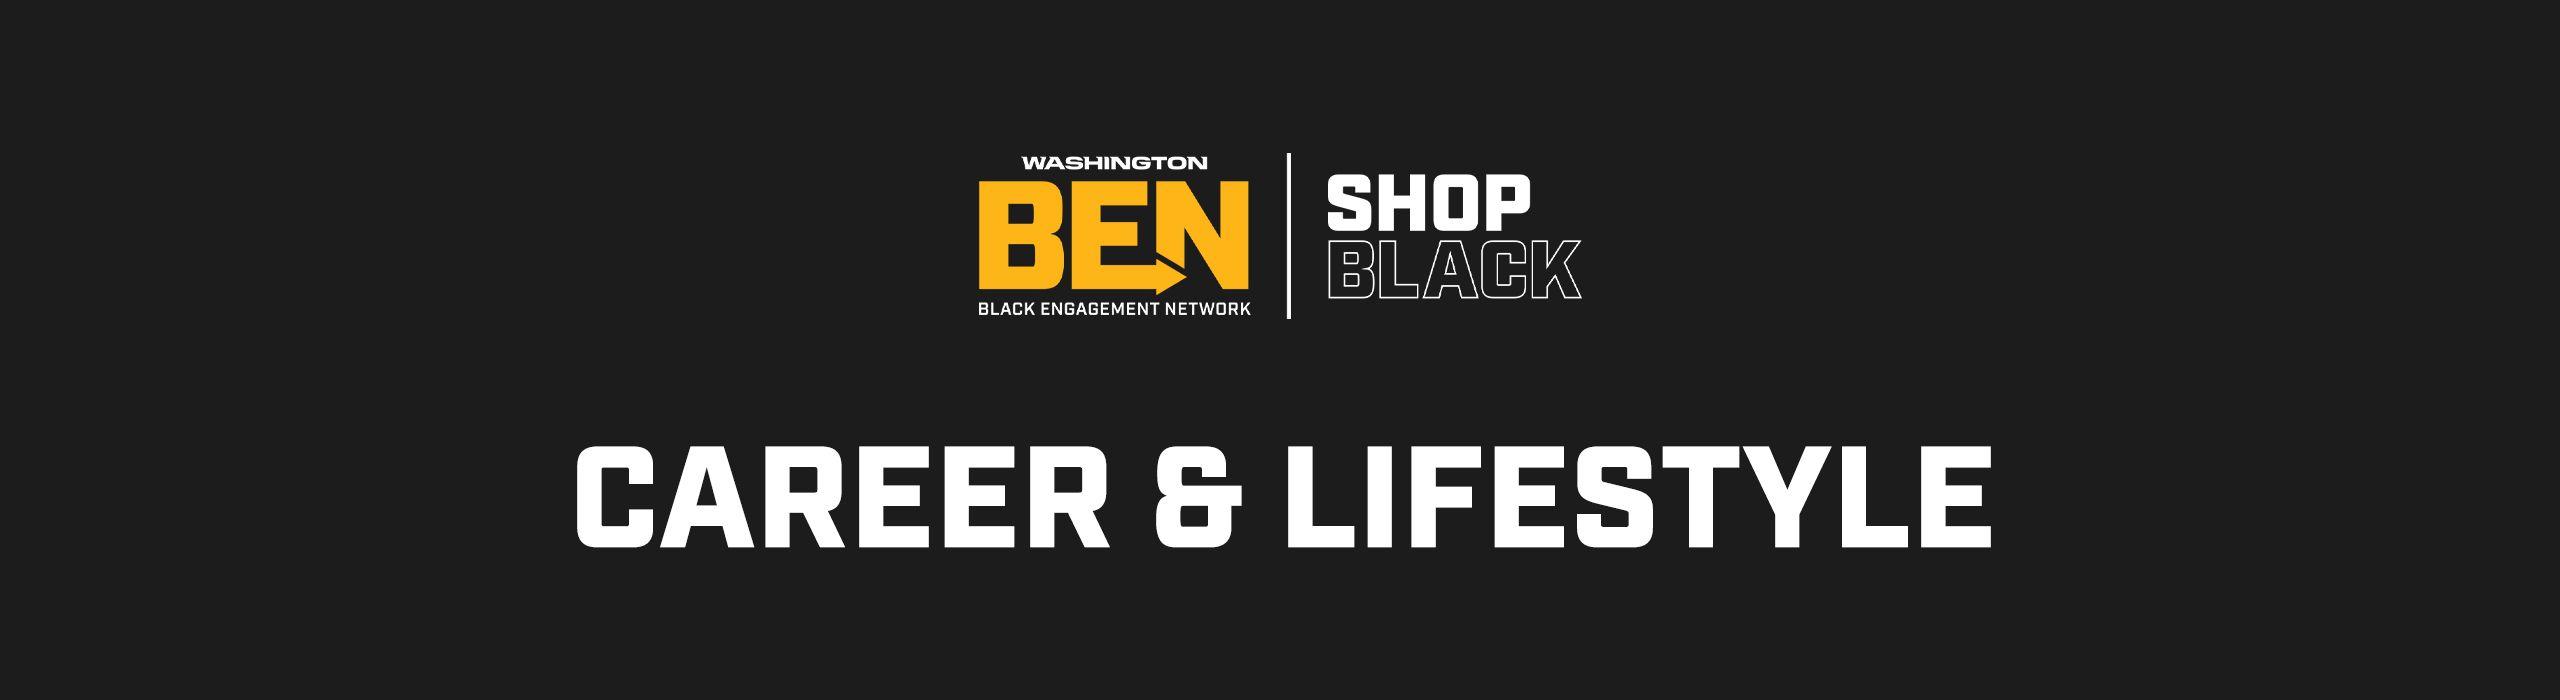 2020BEN_ShopBlack_CategoryPageHeader_Career+Lifestyle